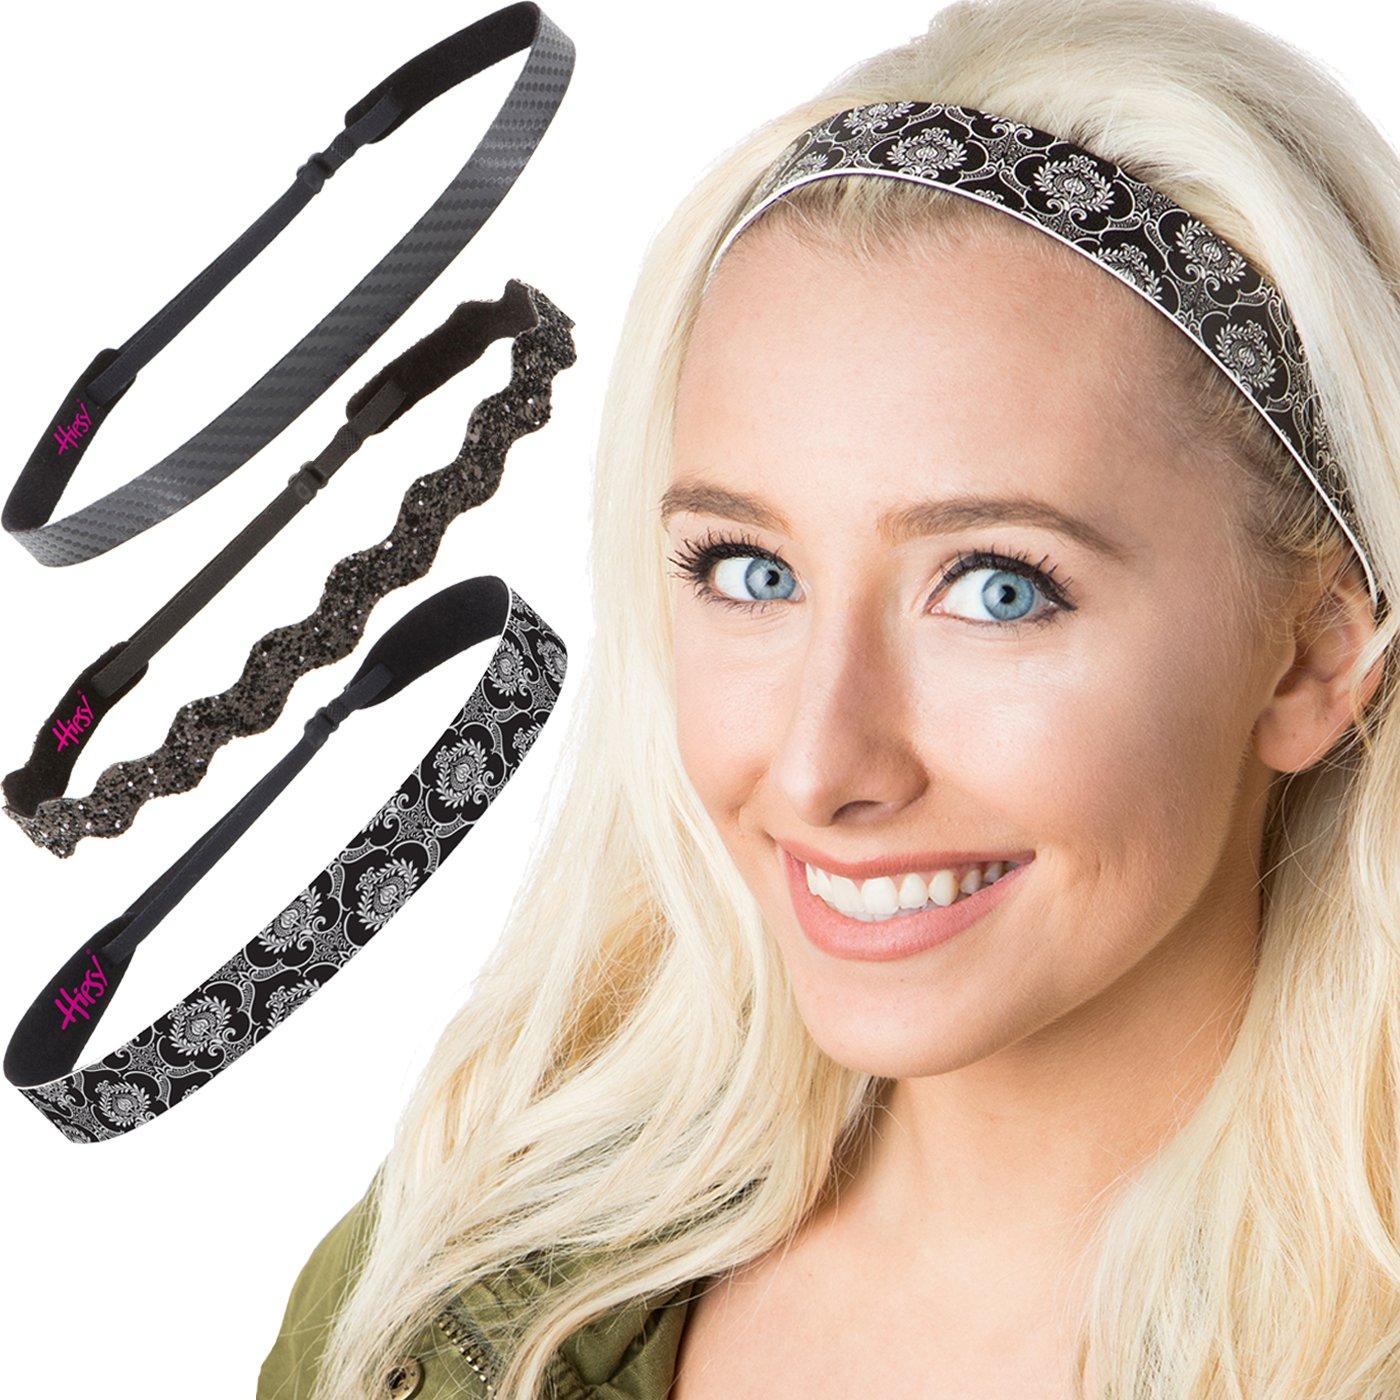 Amazon.com: Hipsy Cute Fashion Adjustable No Slip Hairband Headbands for  Women Girls & Teens (Running Black Headband 3pk): Beauty